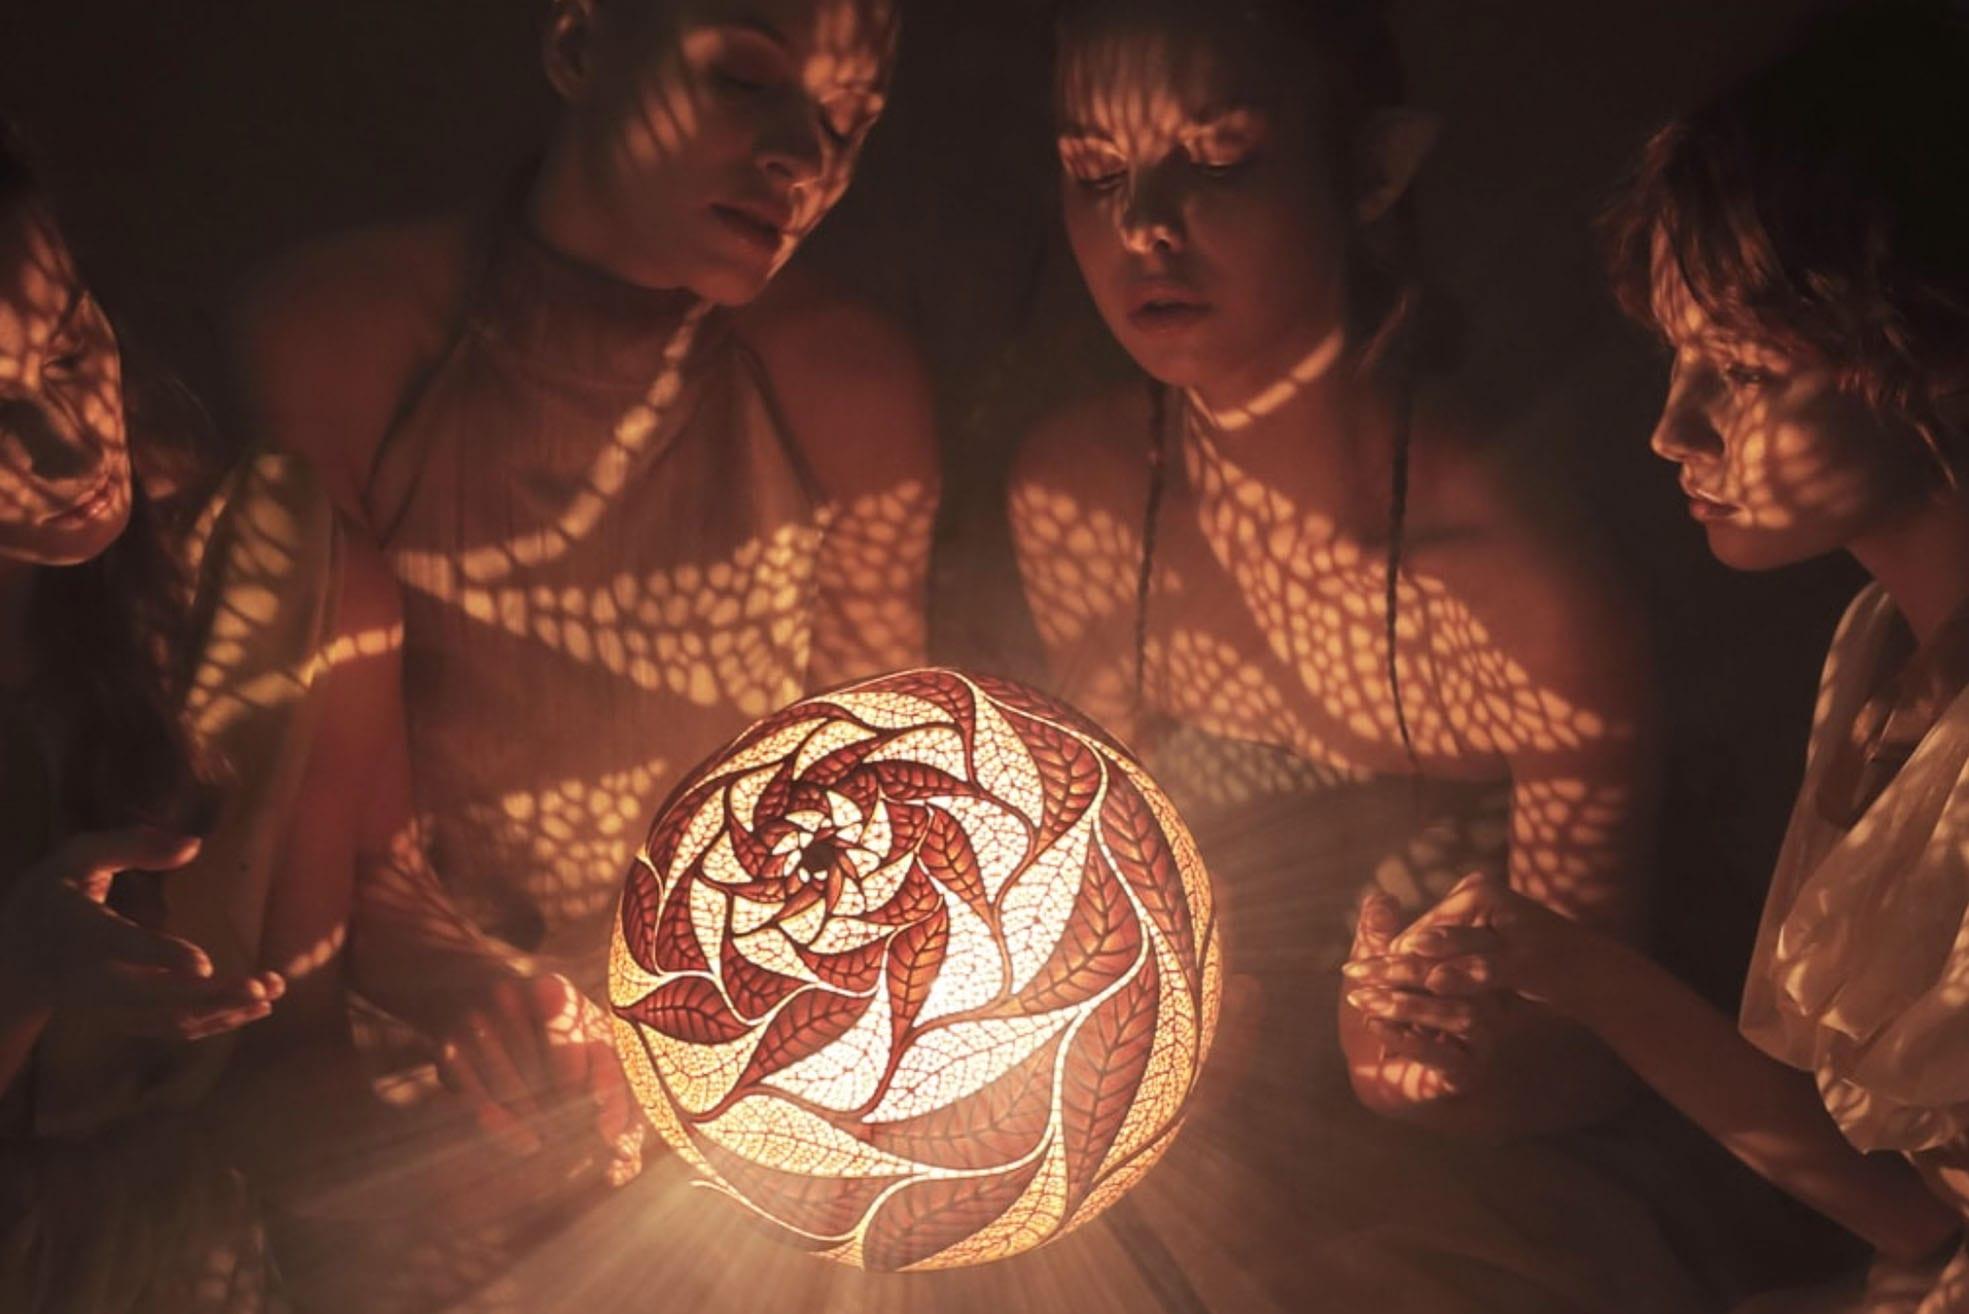 Handmade magical lights by Calabarte